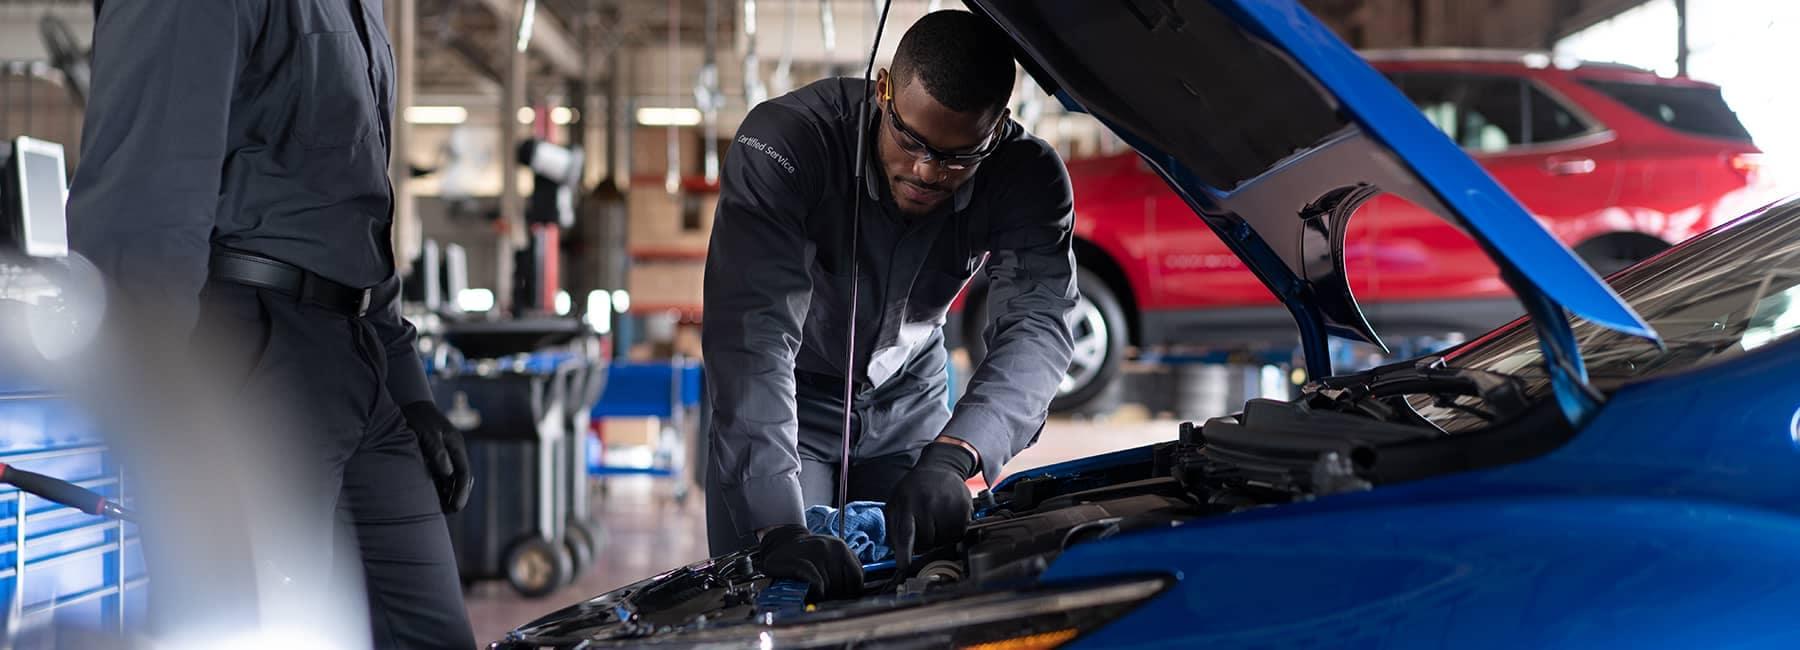 Certified Service Technician checks car engine